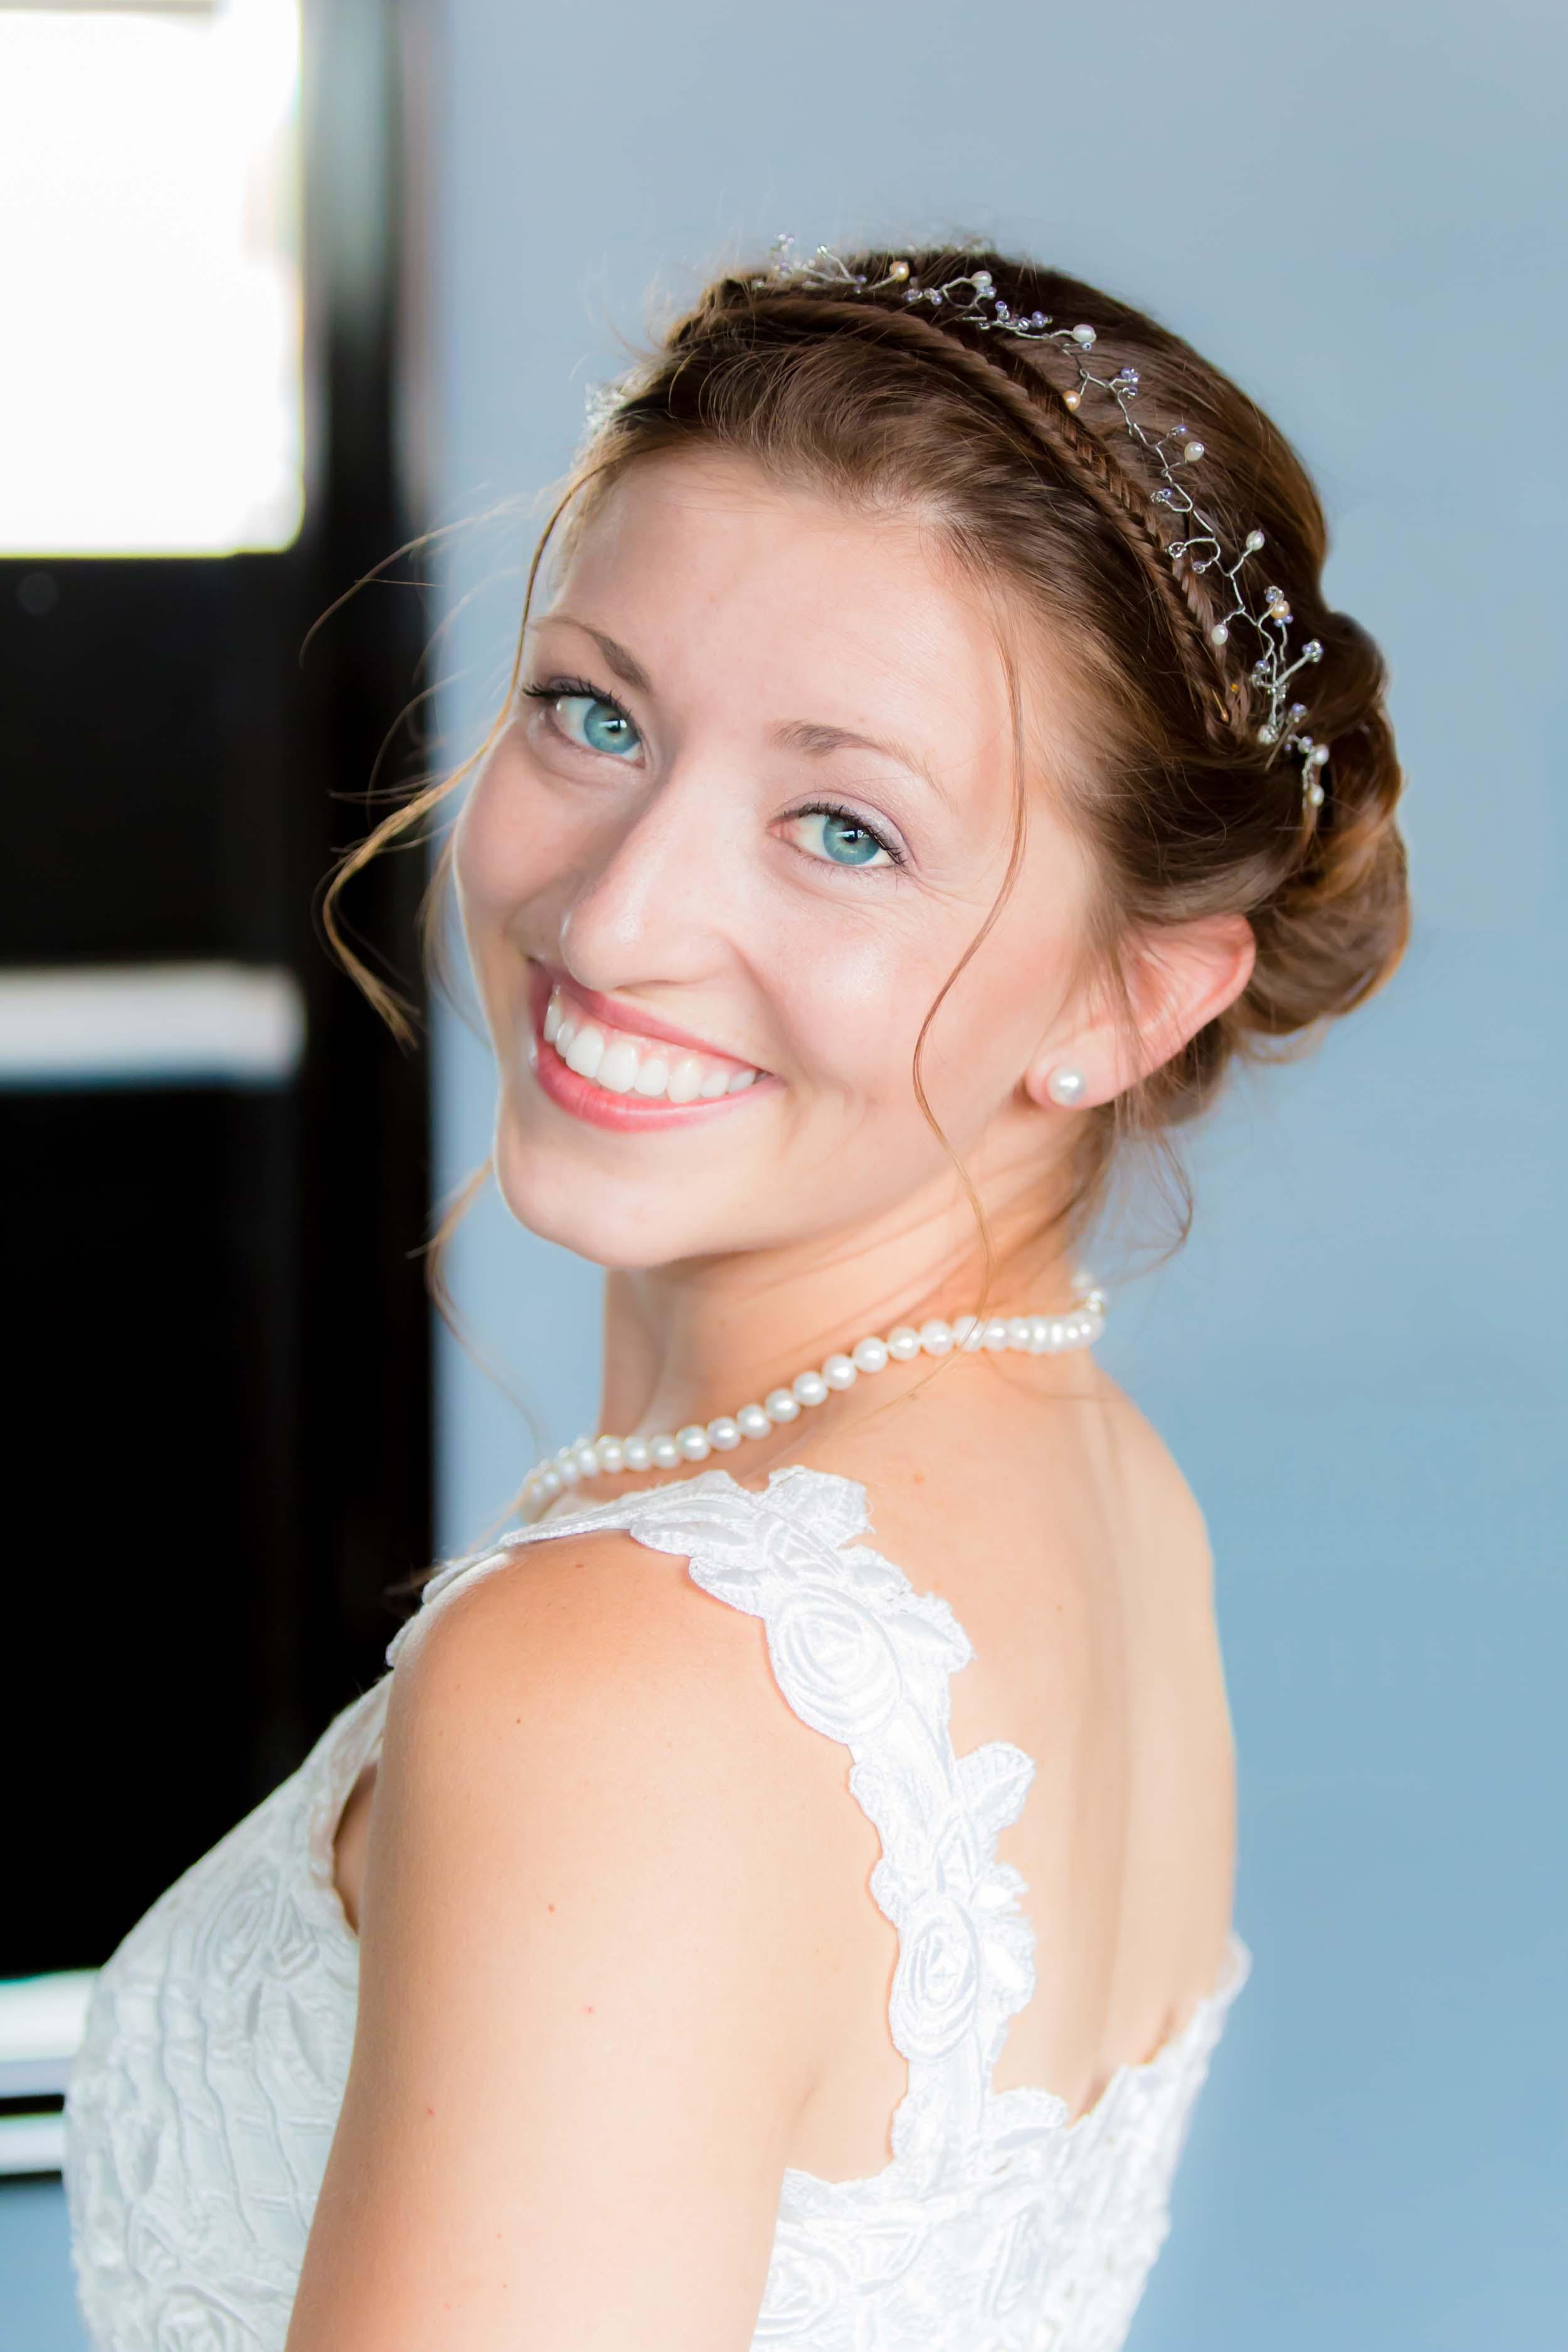 Alan-Amberlyn-Seattle-Wedding-Photography-165-photoshop 2.jpg